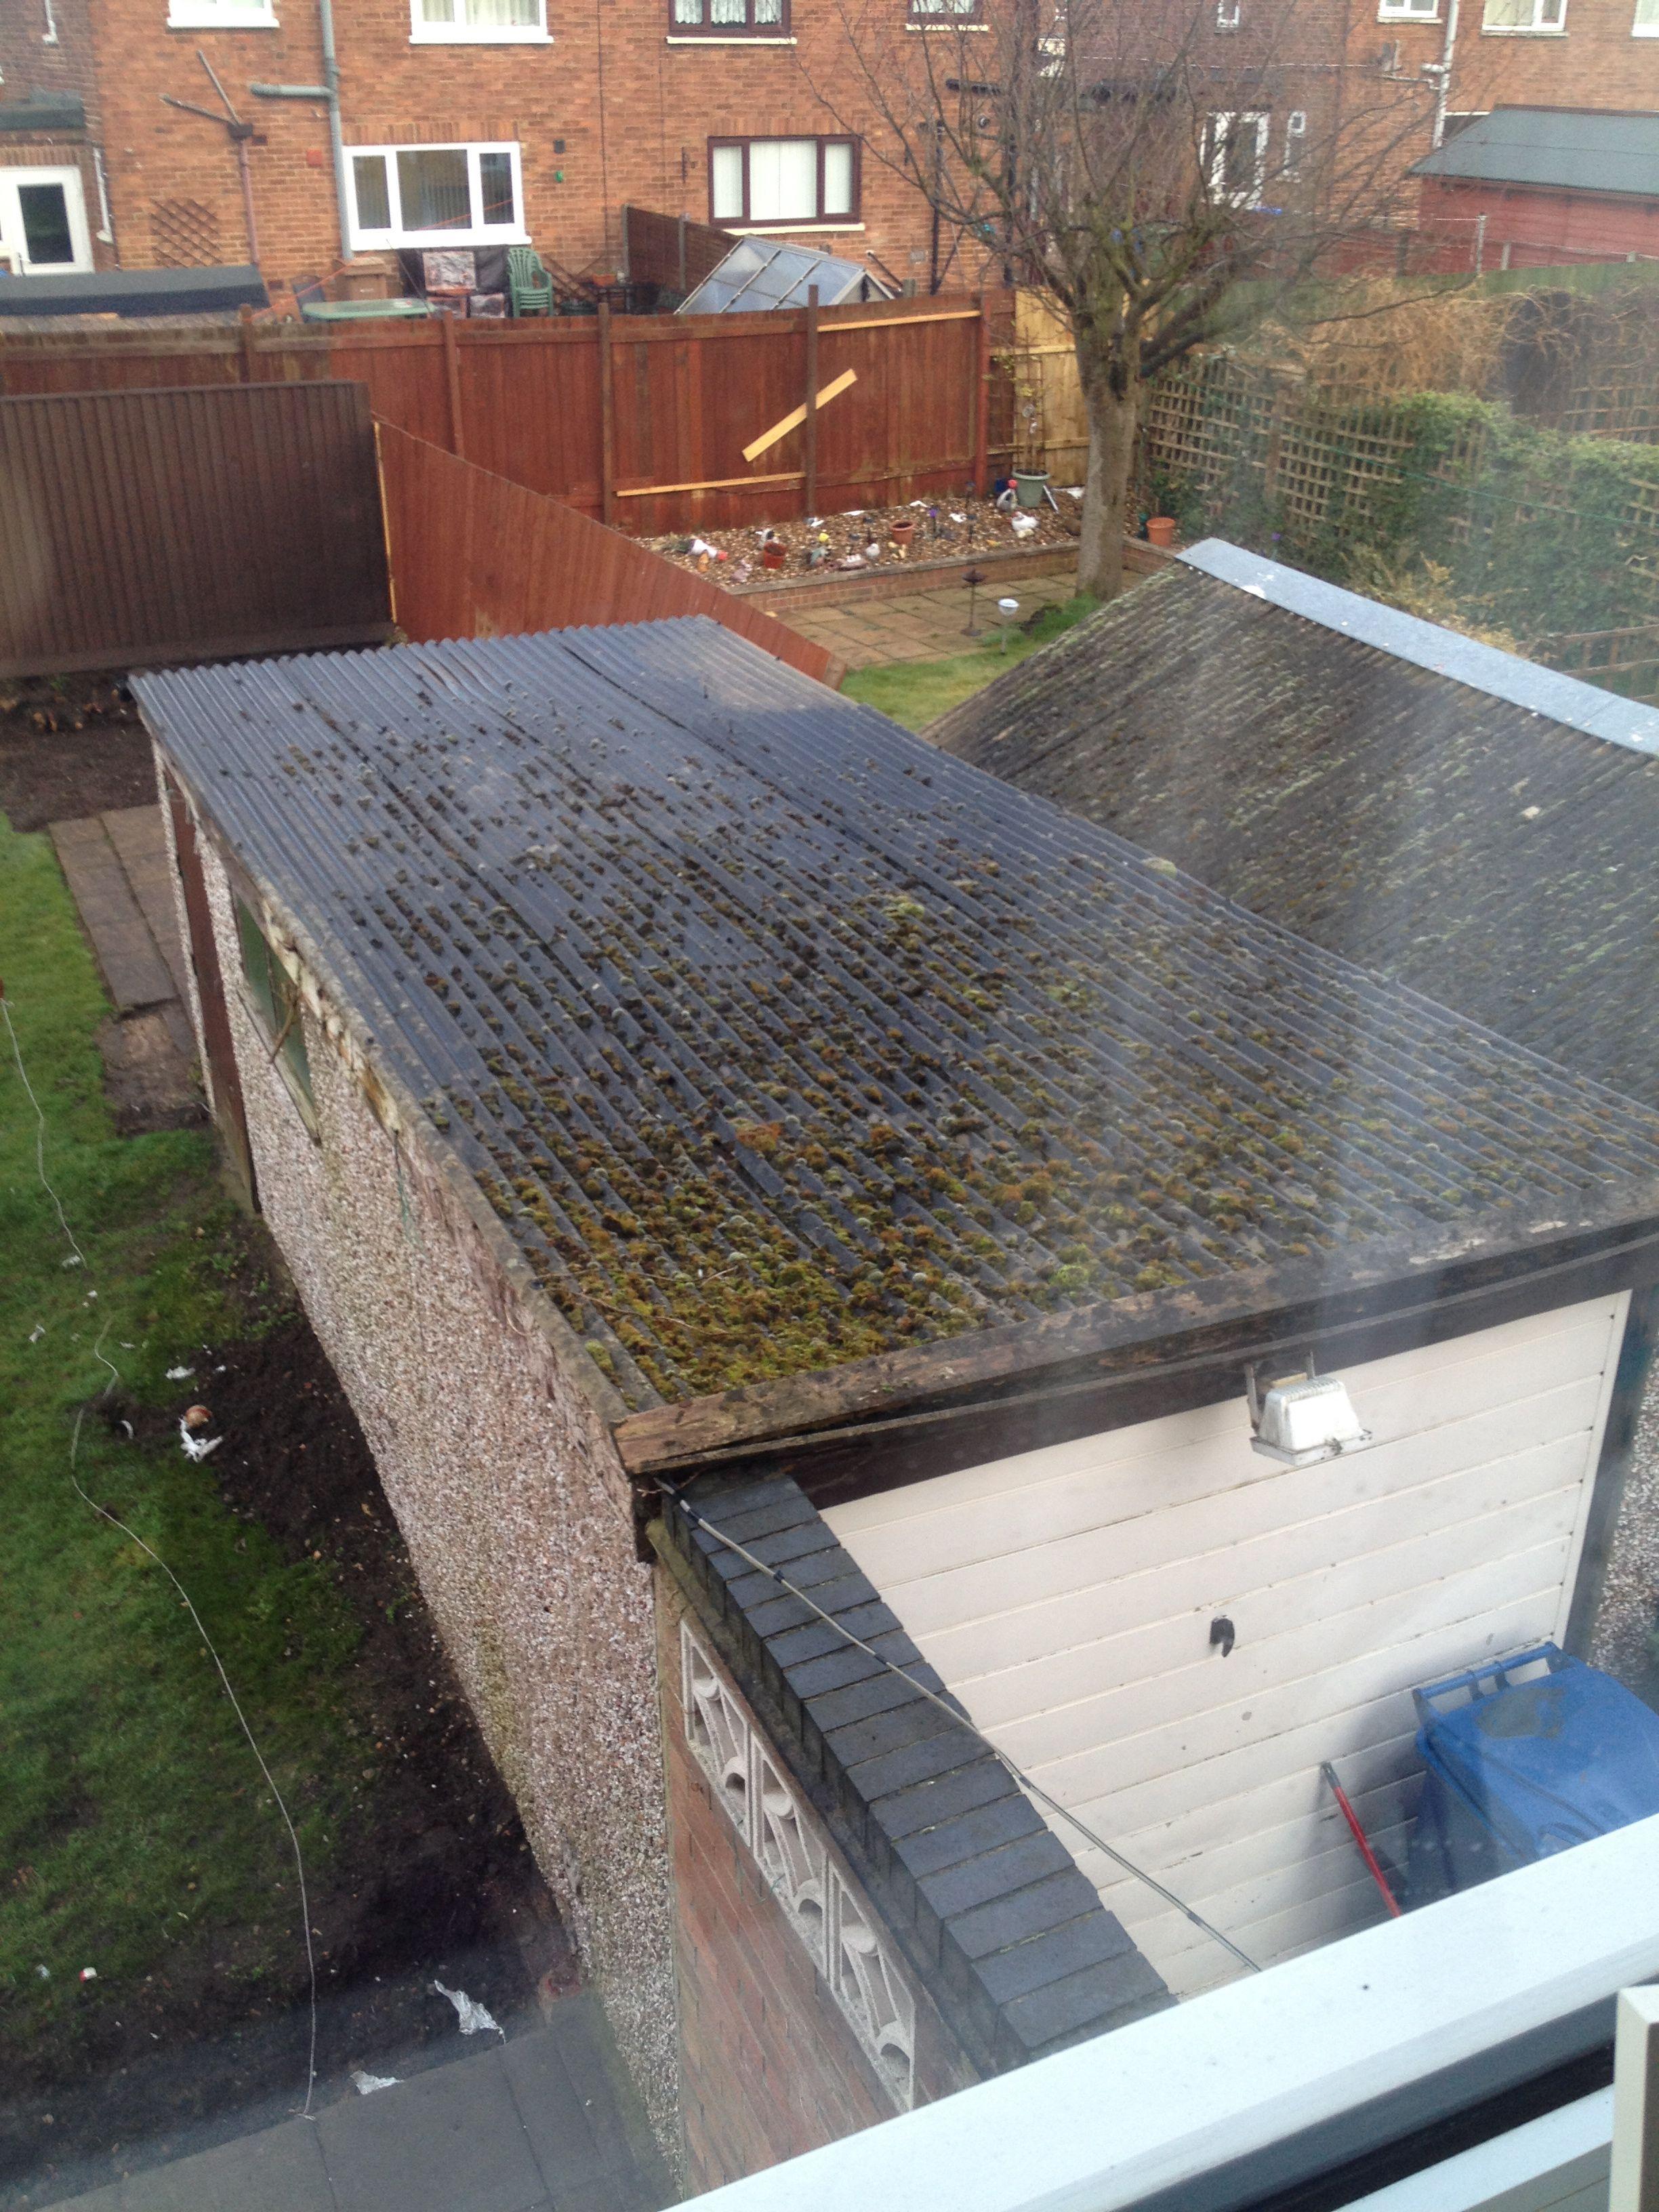 Best The Old Leaking Door Window And Asbestos Roof With 400 x 300